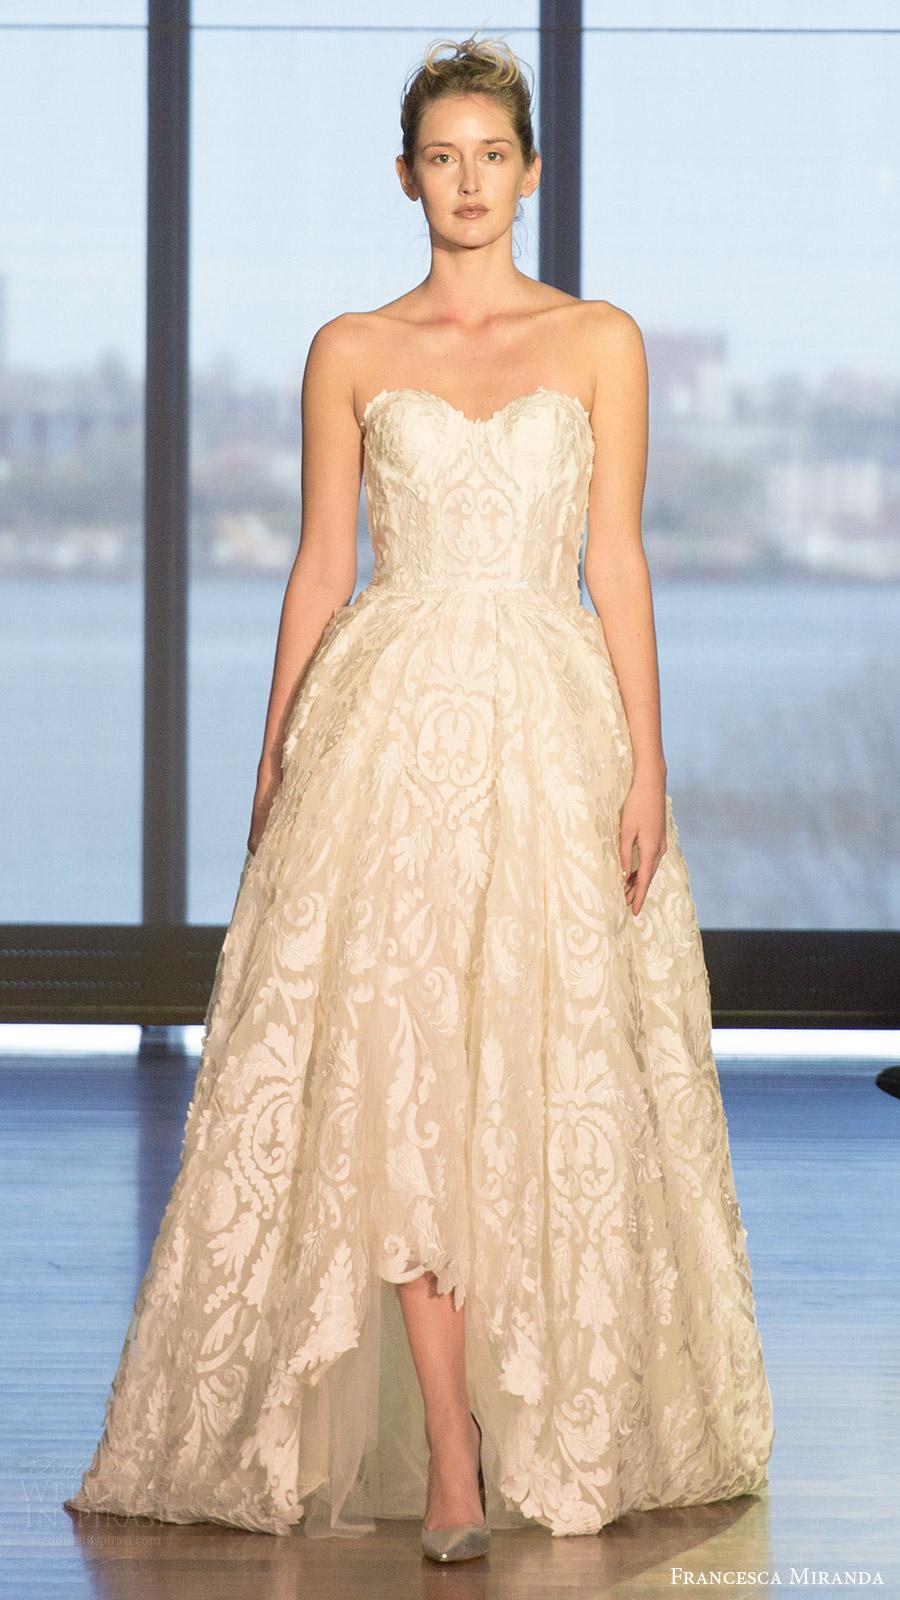 Ball Gown Strapless Wedding Dresses 98 Fresh francesca miranda bridal spring